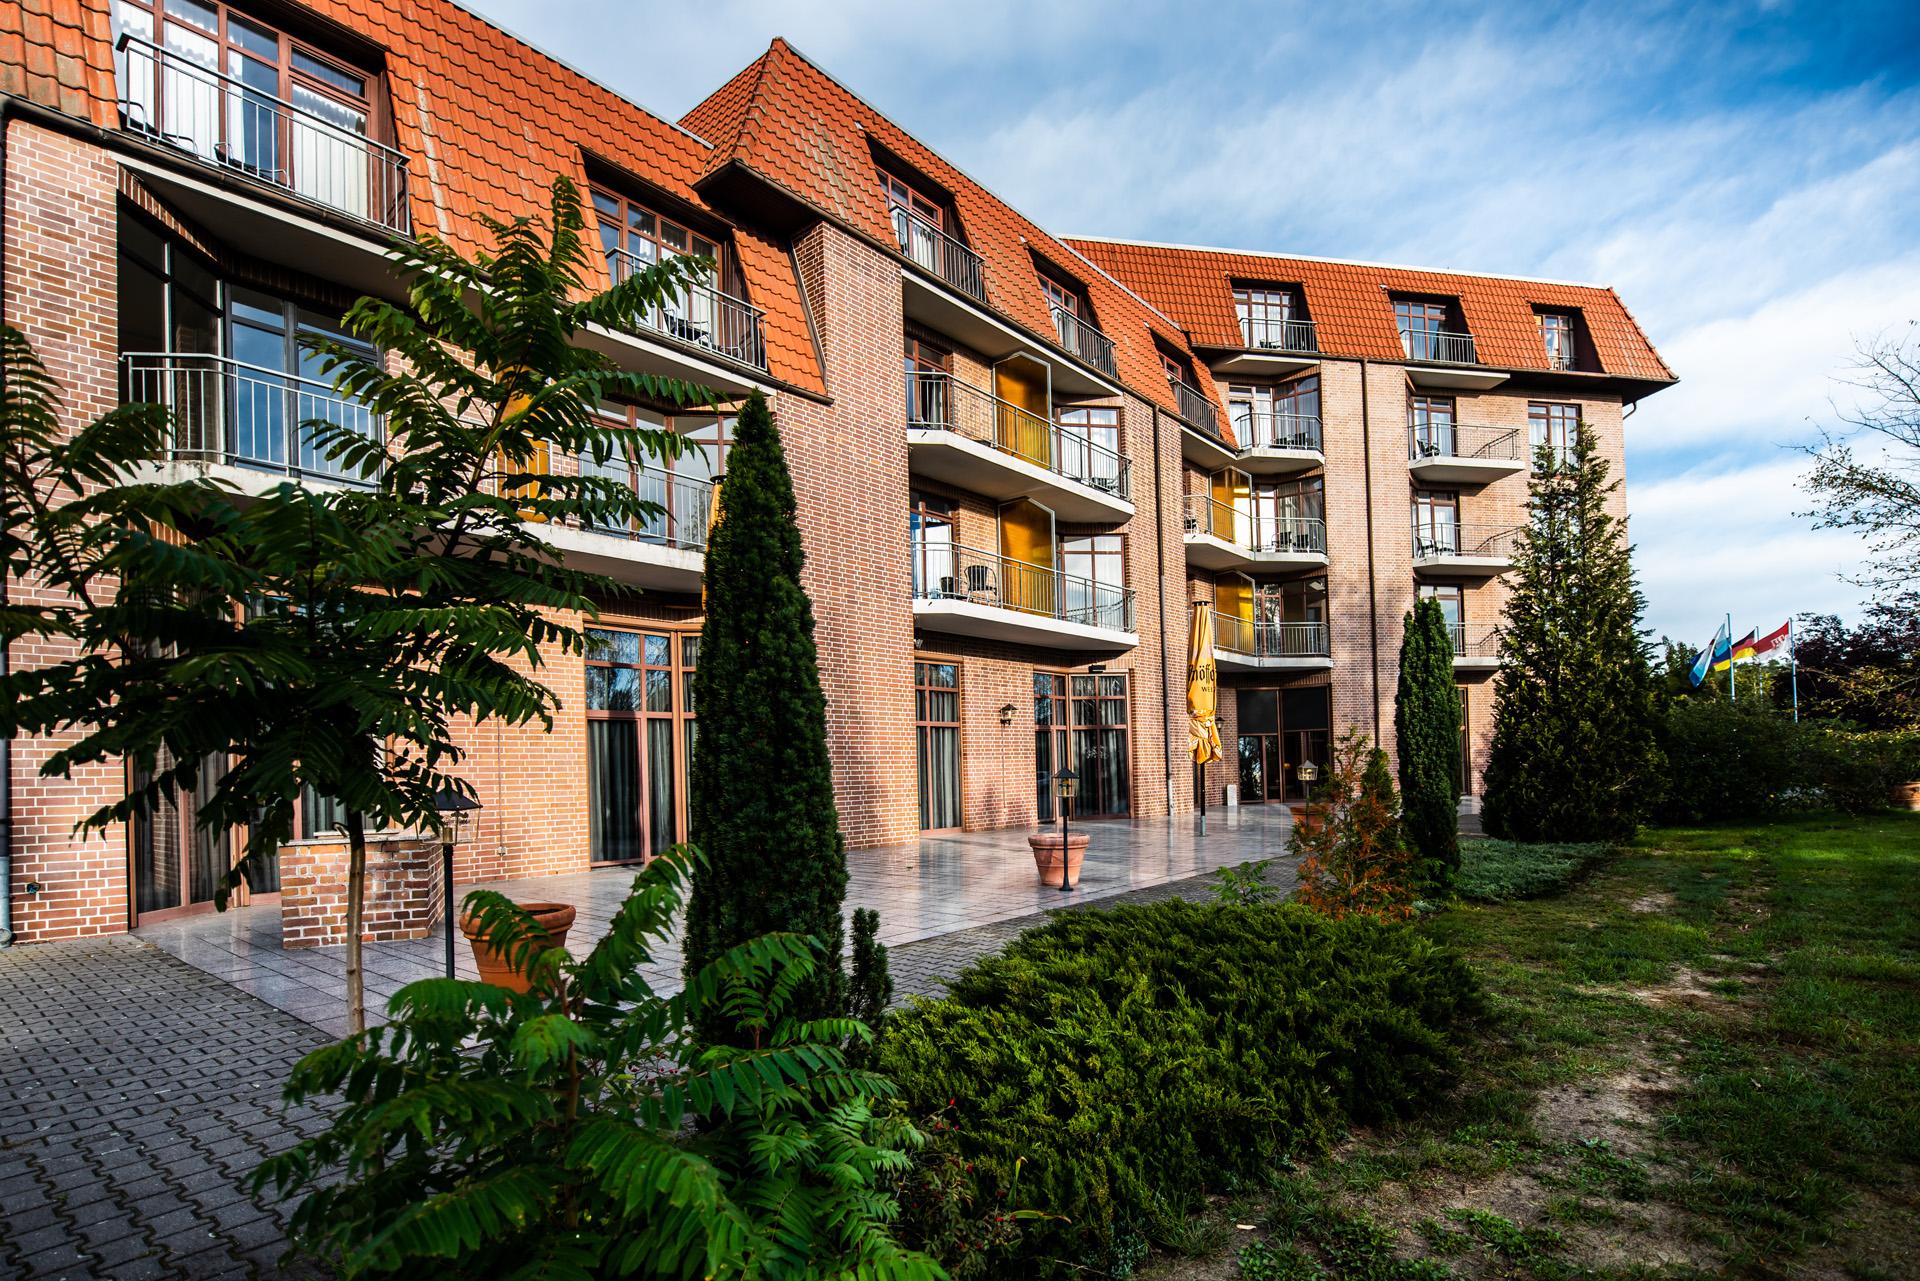 Vincera-Klinik Spreewald eröffnet, André Matthes zur Spreewaldmalerei, Liuba-Gallery eröffnet.